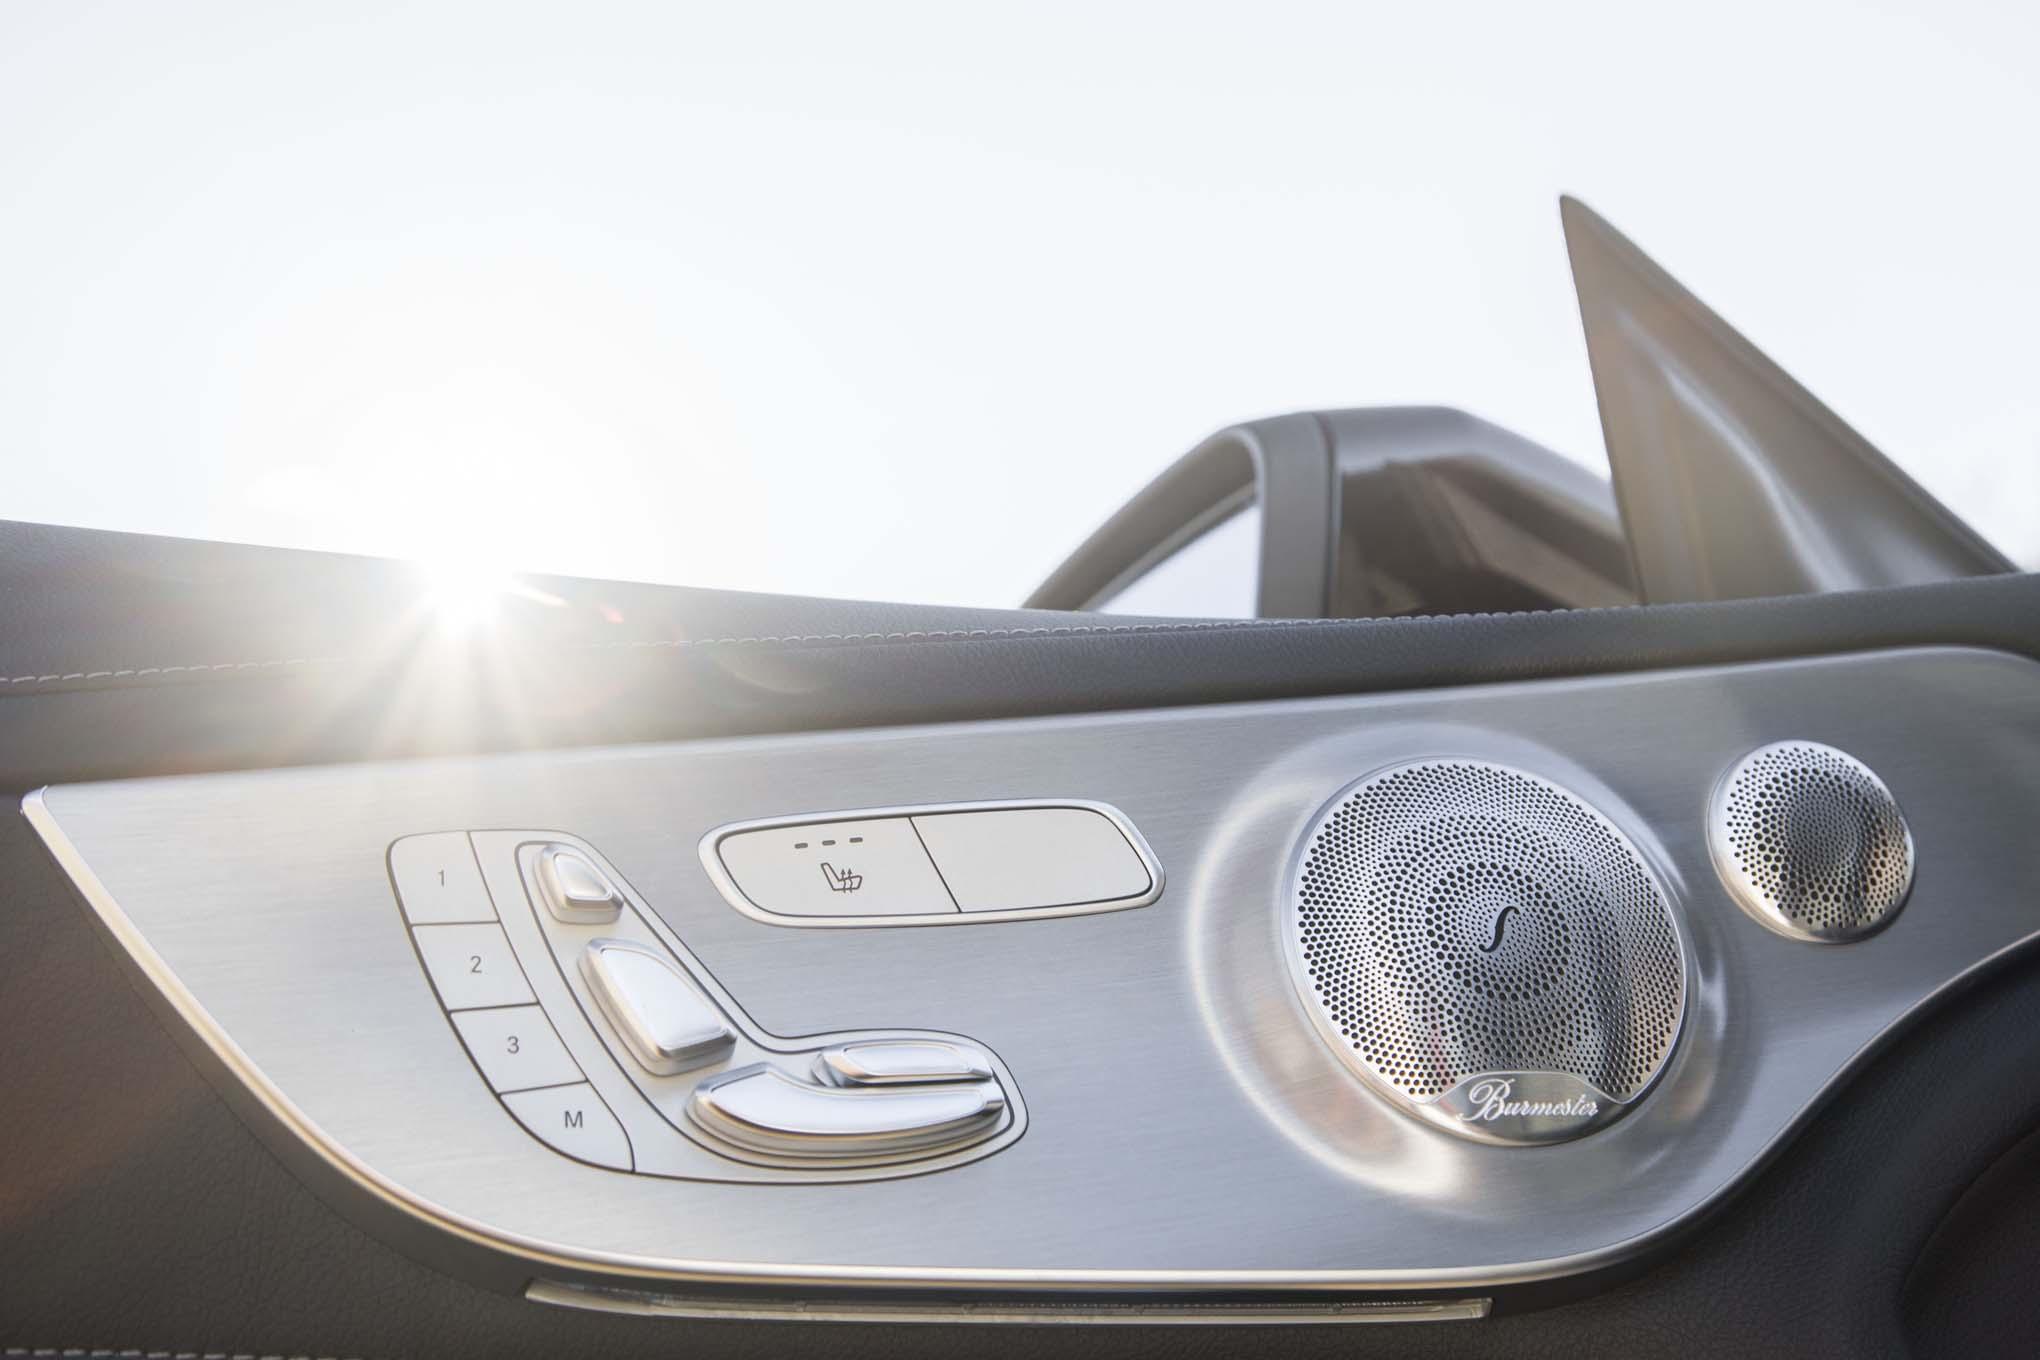 2017 Mercedes AMG C43 Coupe Interior Door Panel